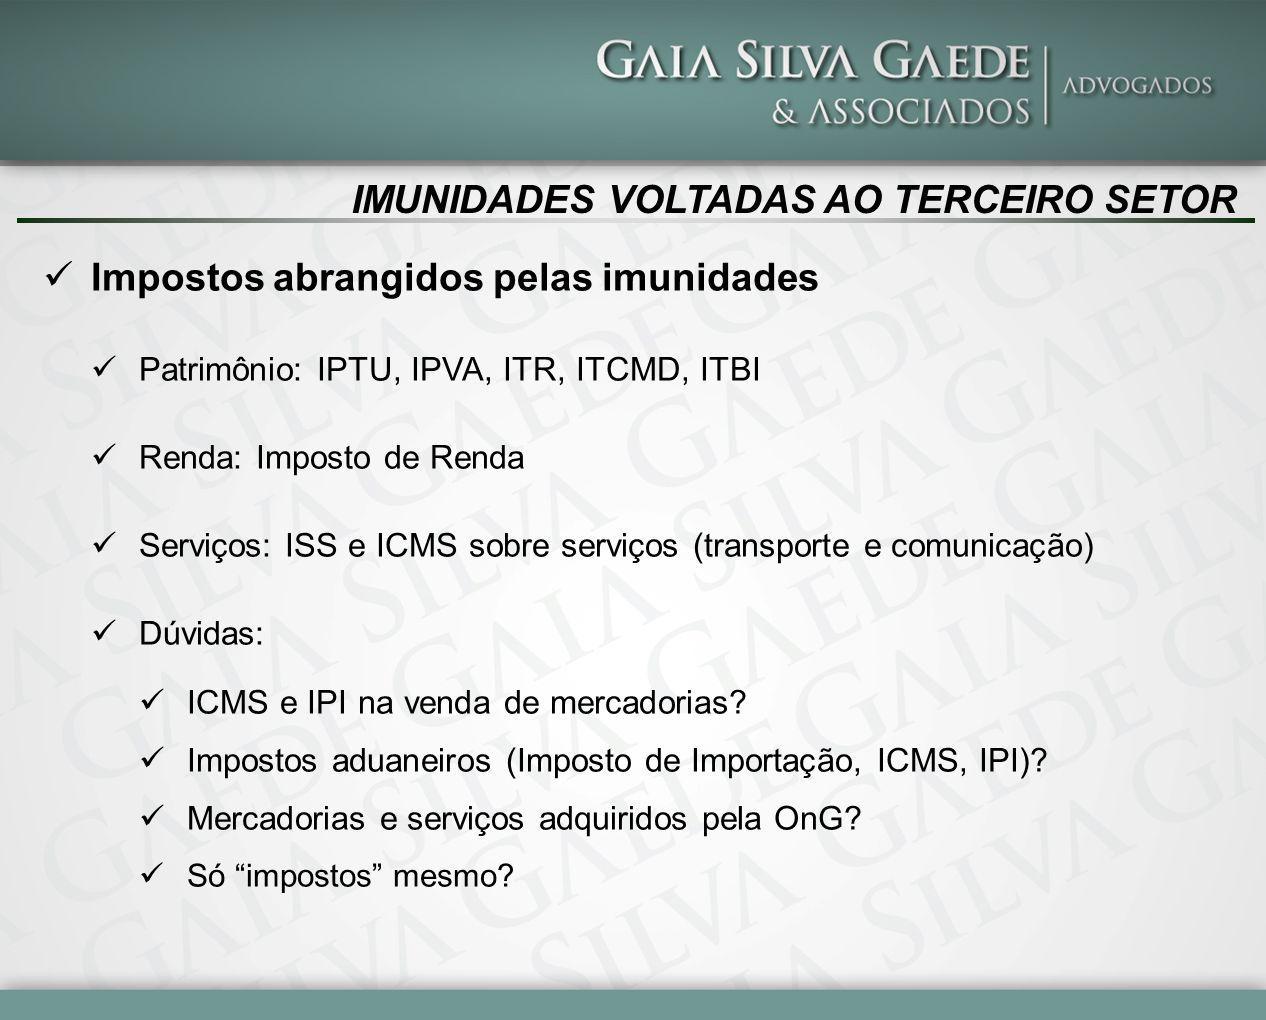 IMUNIDADES VOLTADAS AO TERCEIRO SETOR Impostos abrangidos pelas imunidades Patrimônio: IPTU, IPVA, ITR, ITCMD, ITBI Renda: Imposto de Renda Serviços: